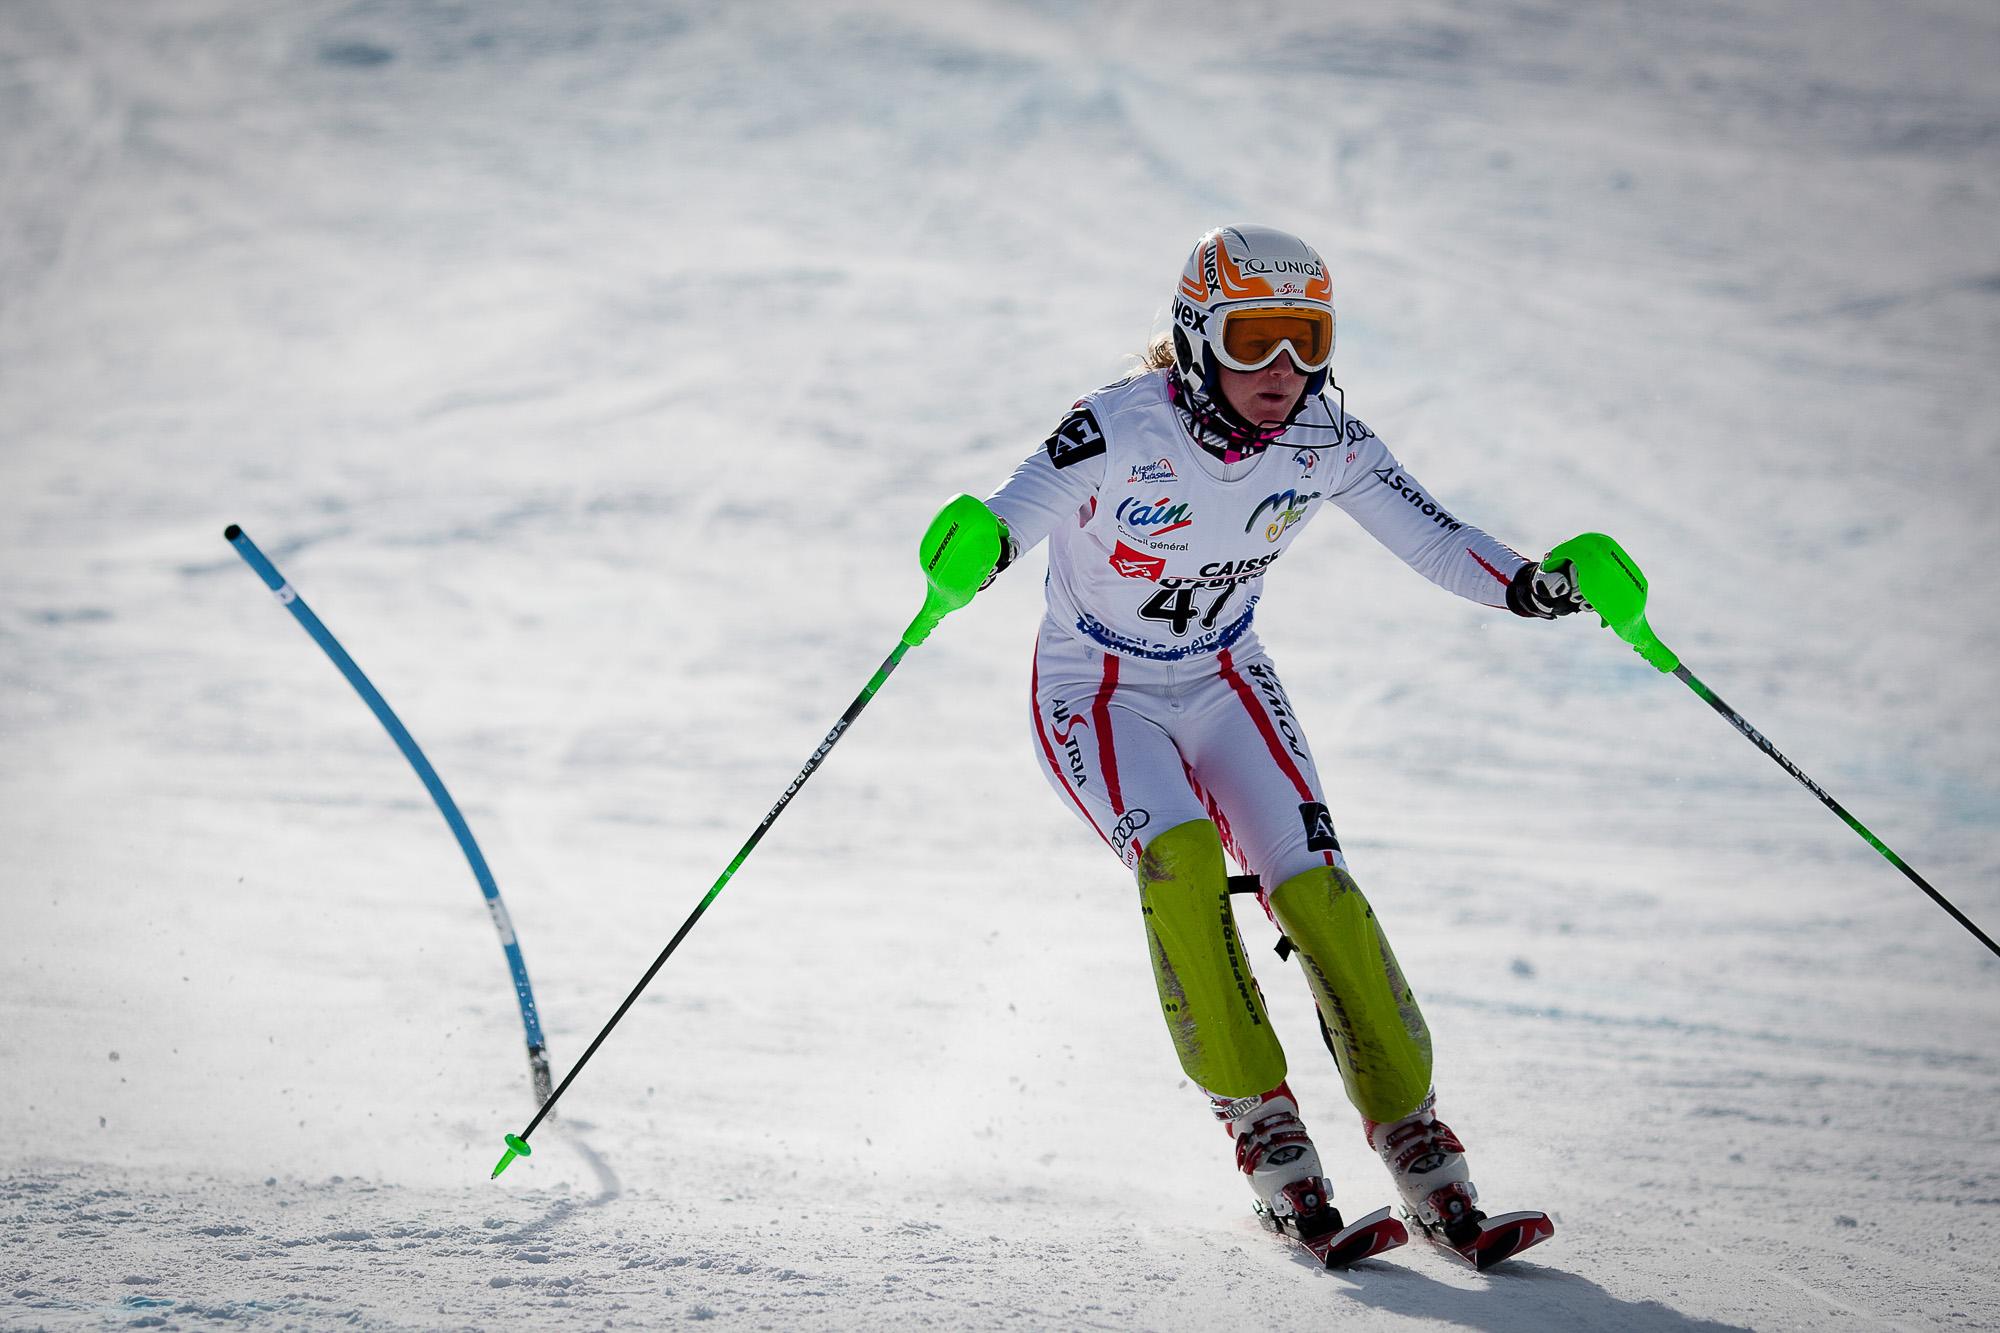 Coupe_Europe_ski_dames-343.jpg